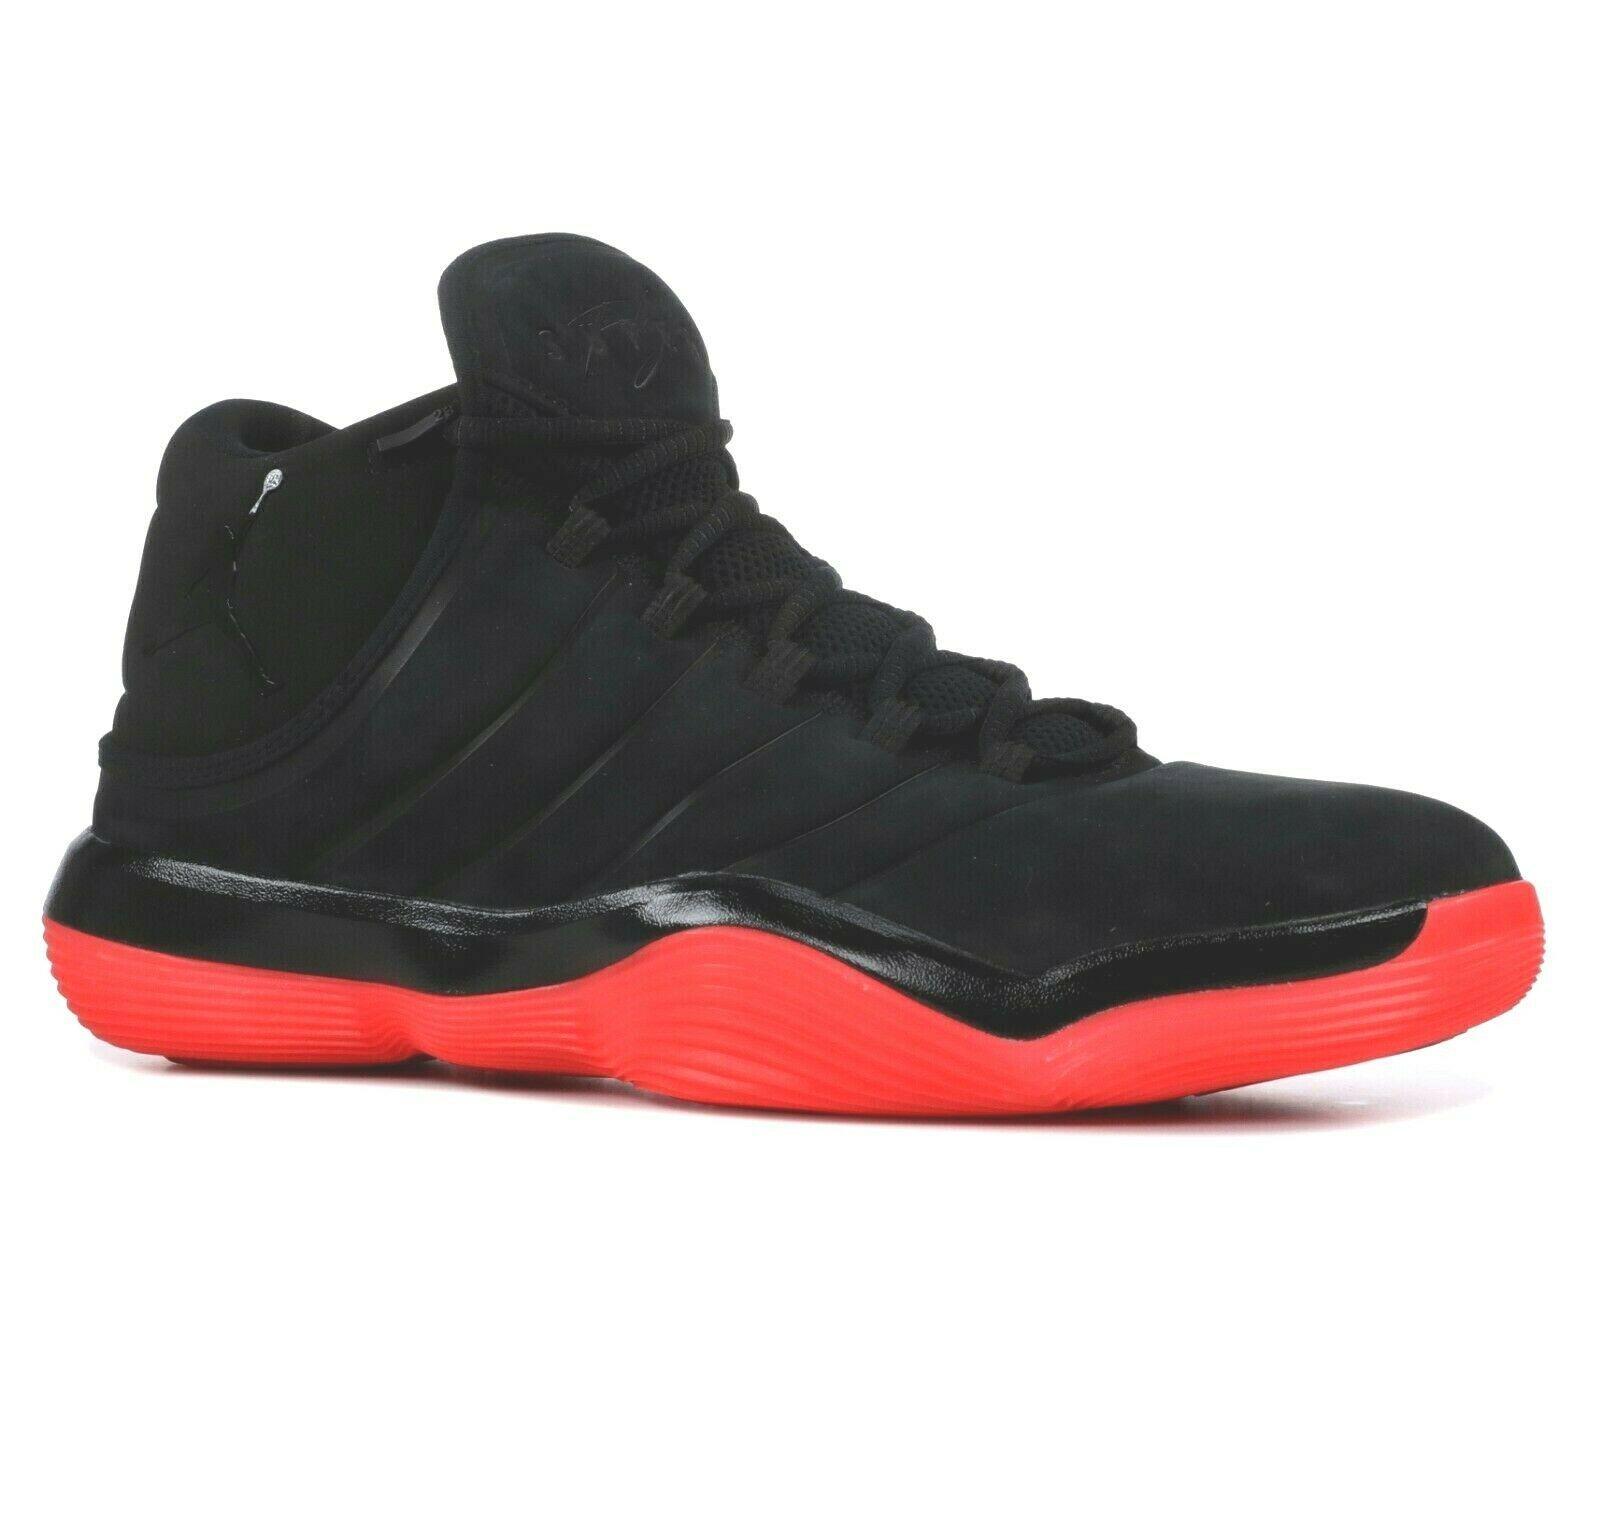 sneakers for cheap d53b7 c9f54 Nike Air Jordan Super Fly 2017 Black and 31 similar items. 57